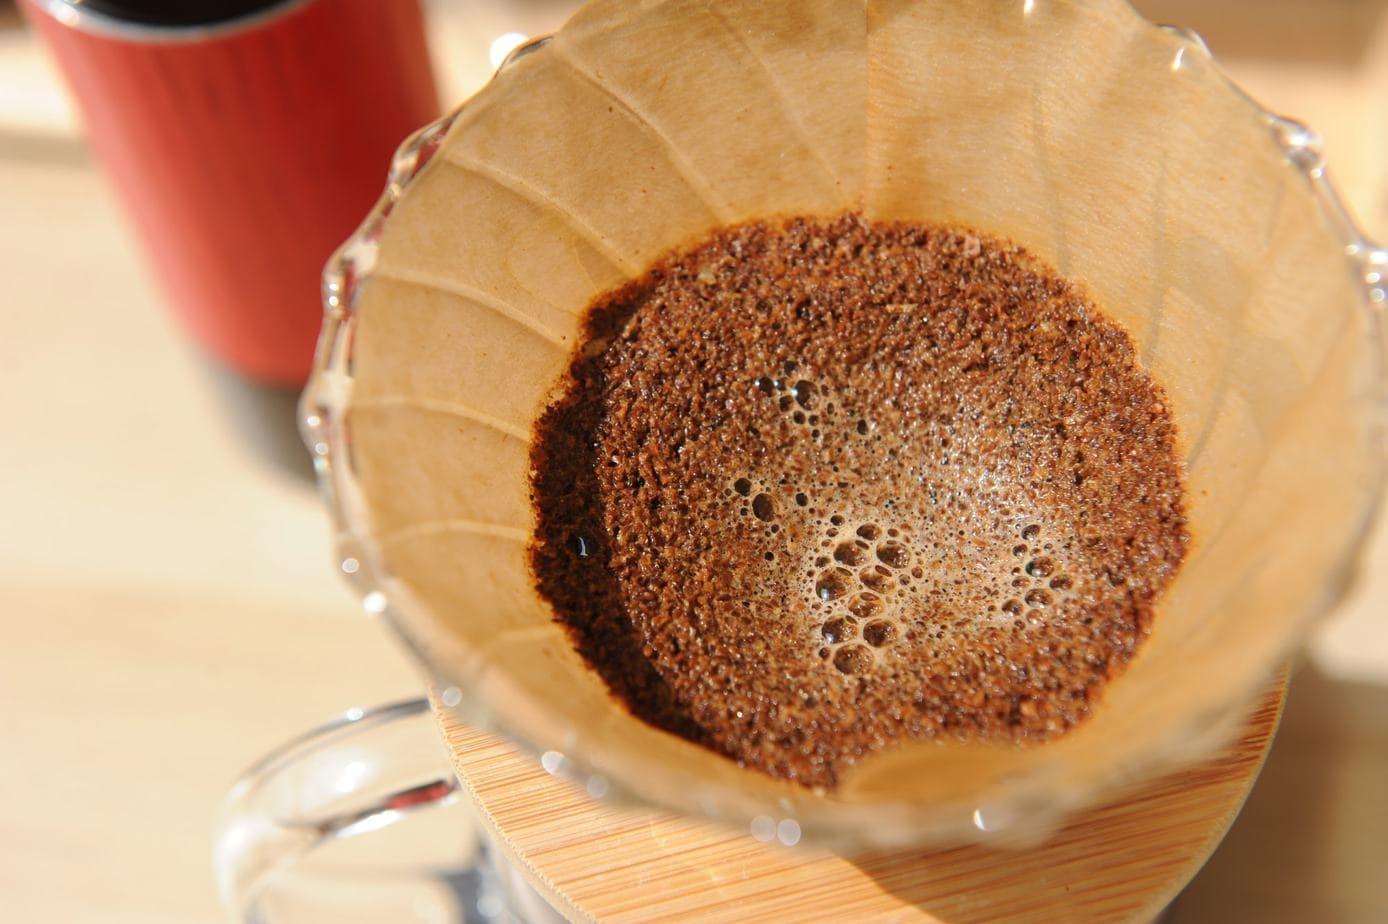 Reuse Coffee Filter